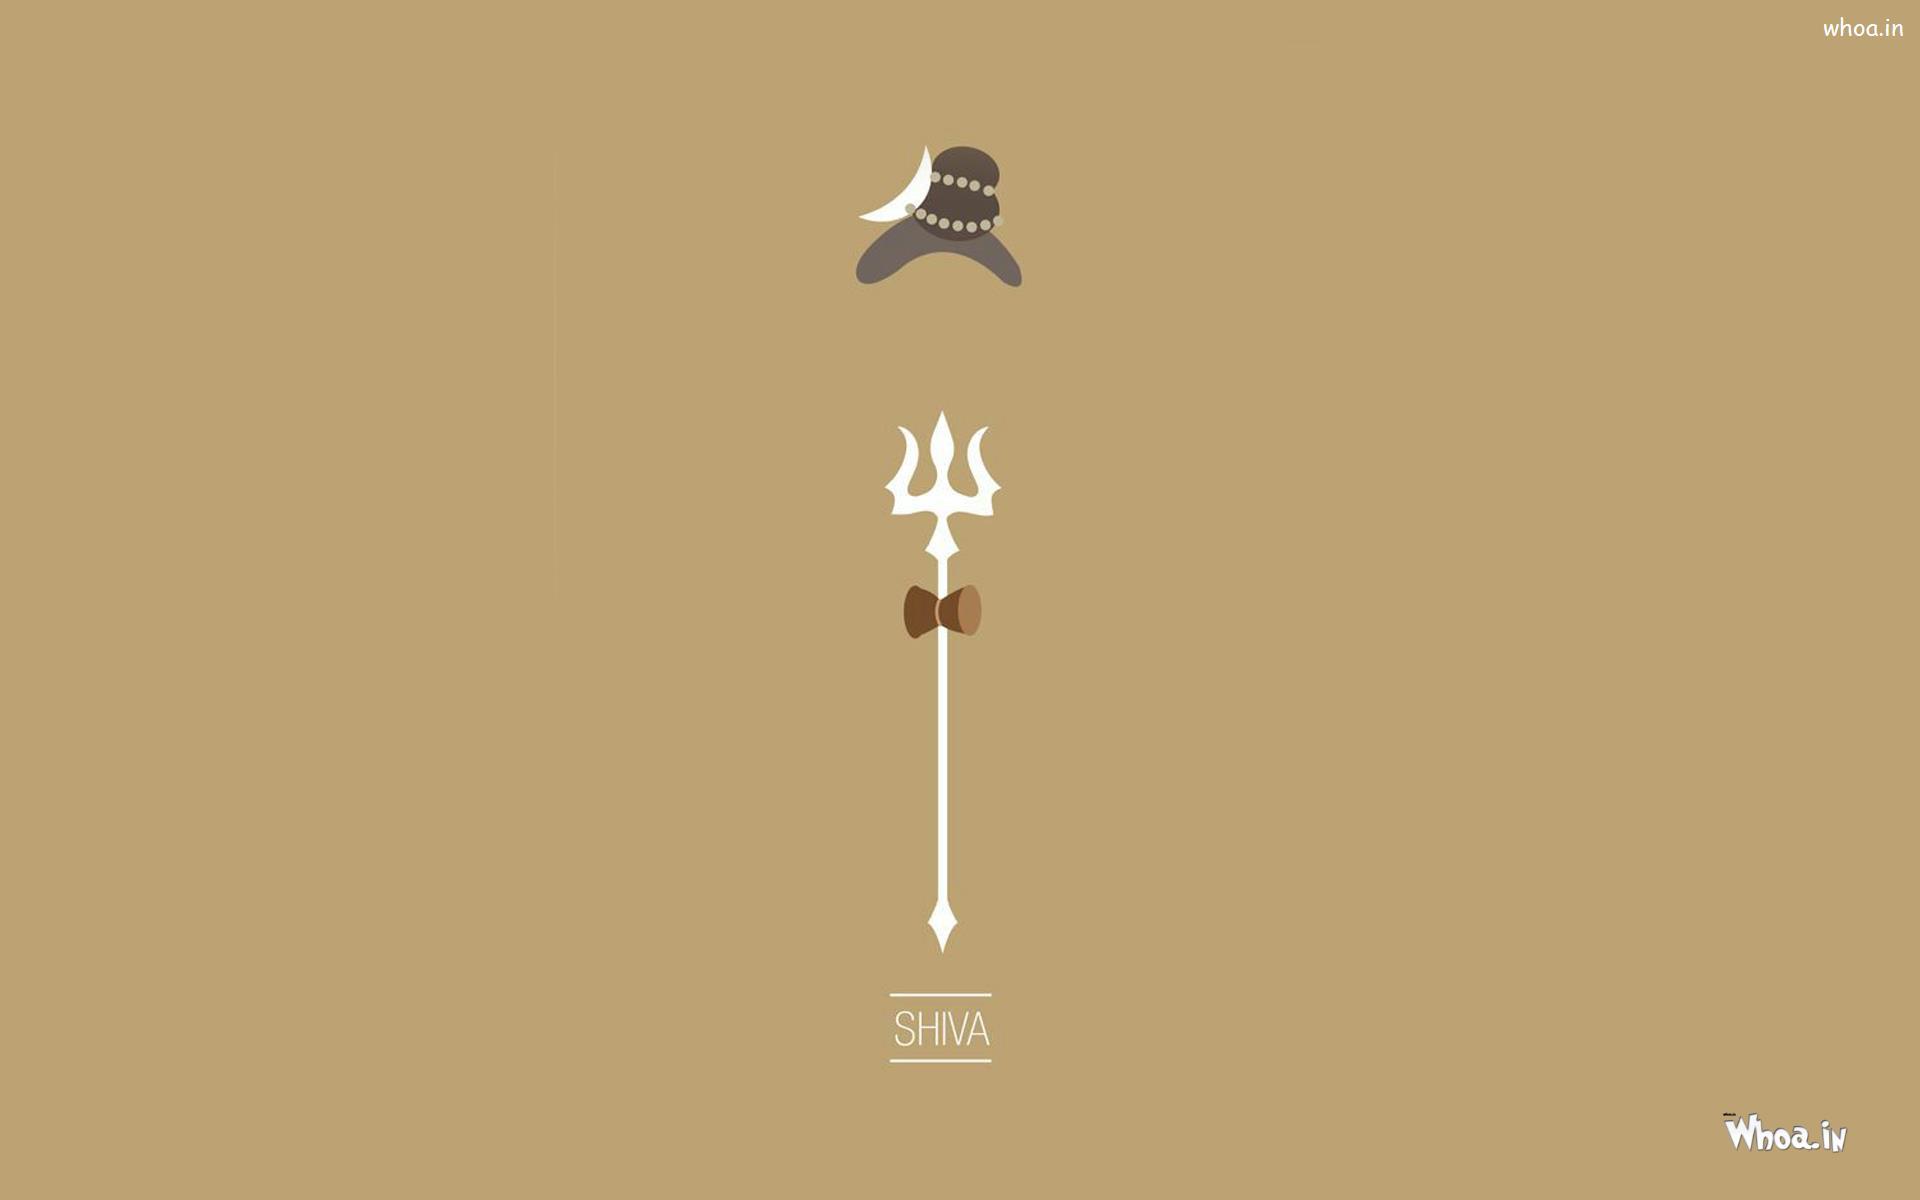 Lord shiva trishul picture - Lord Shiva Trishul